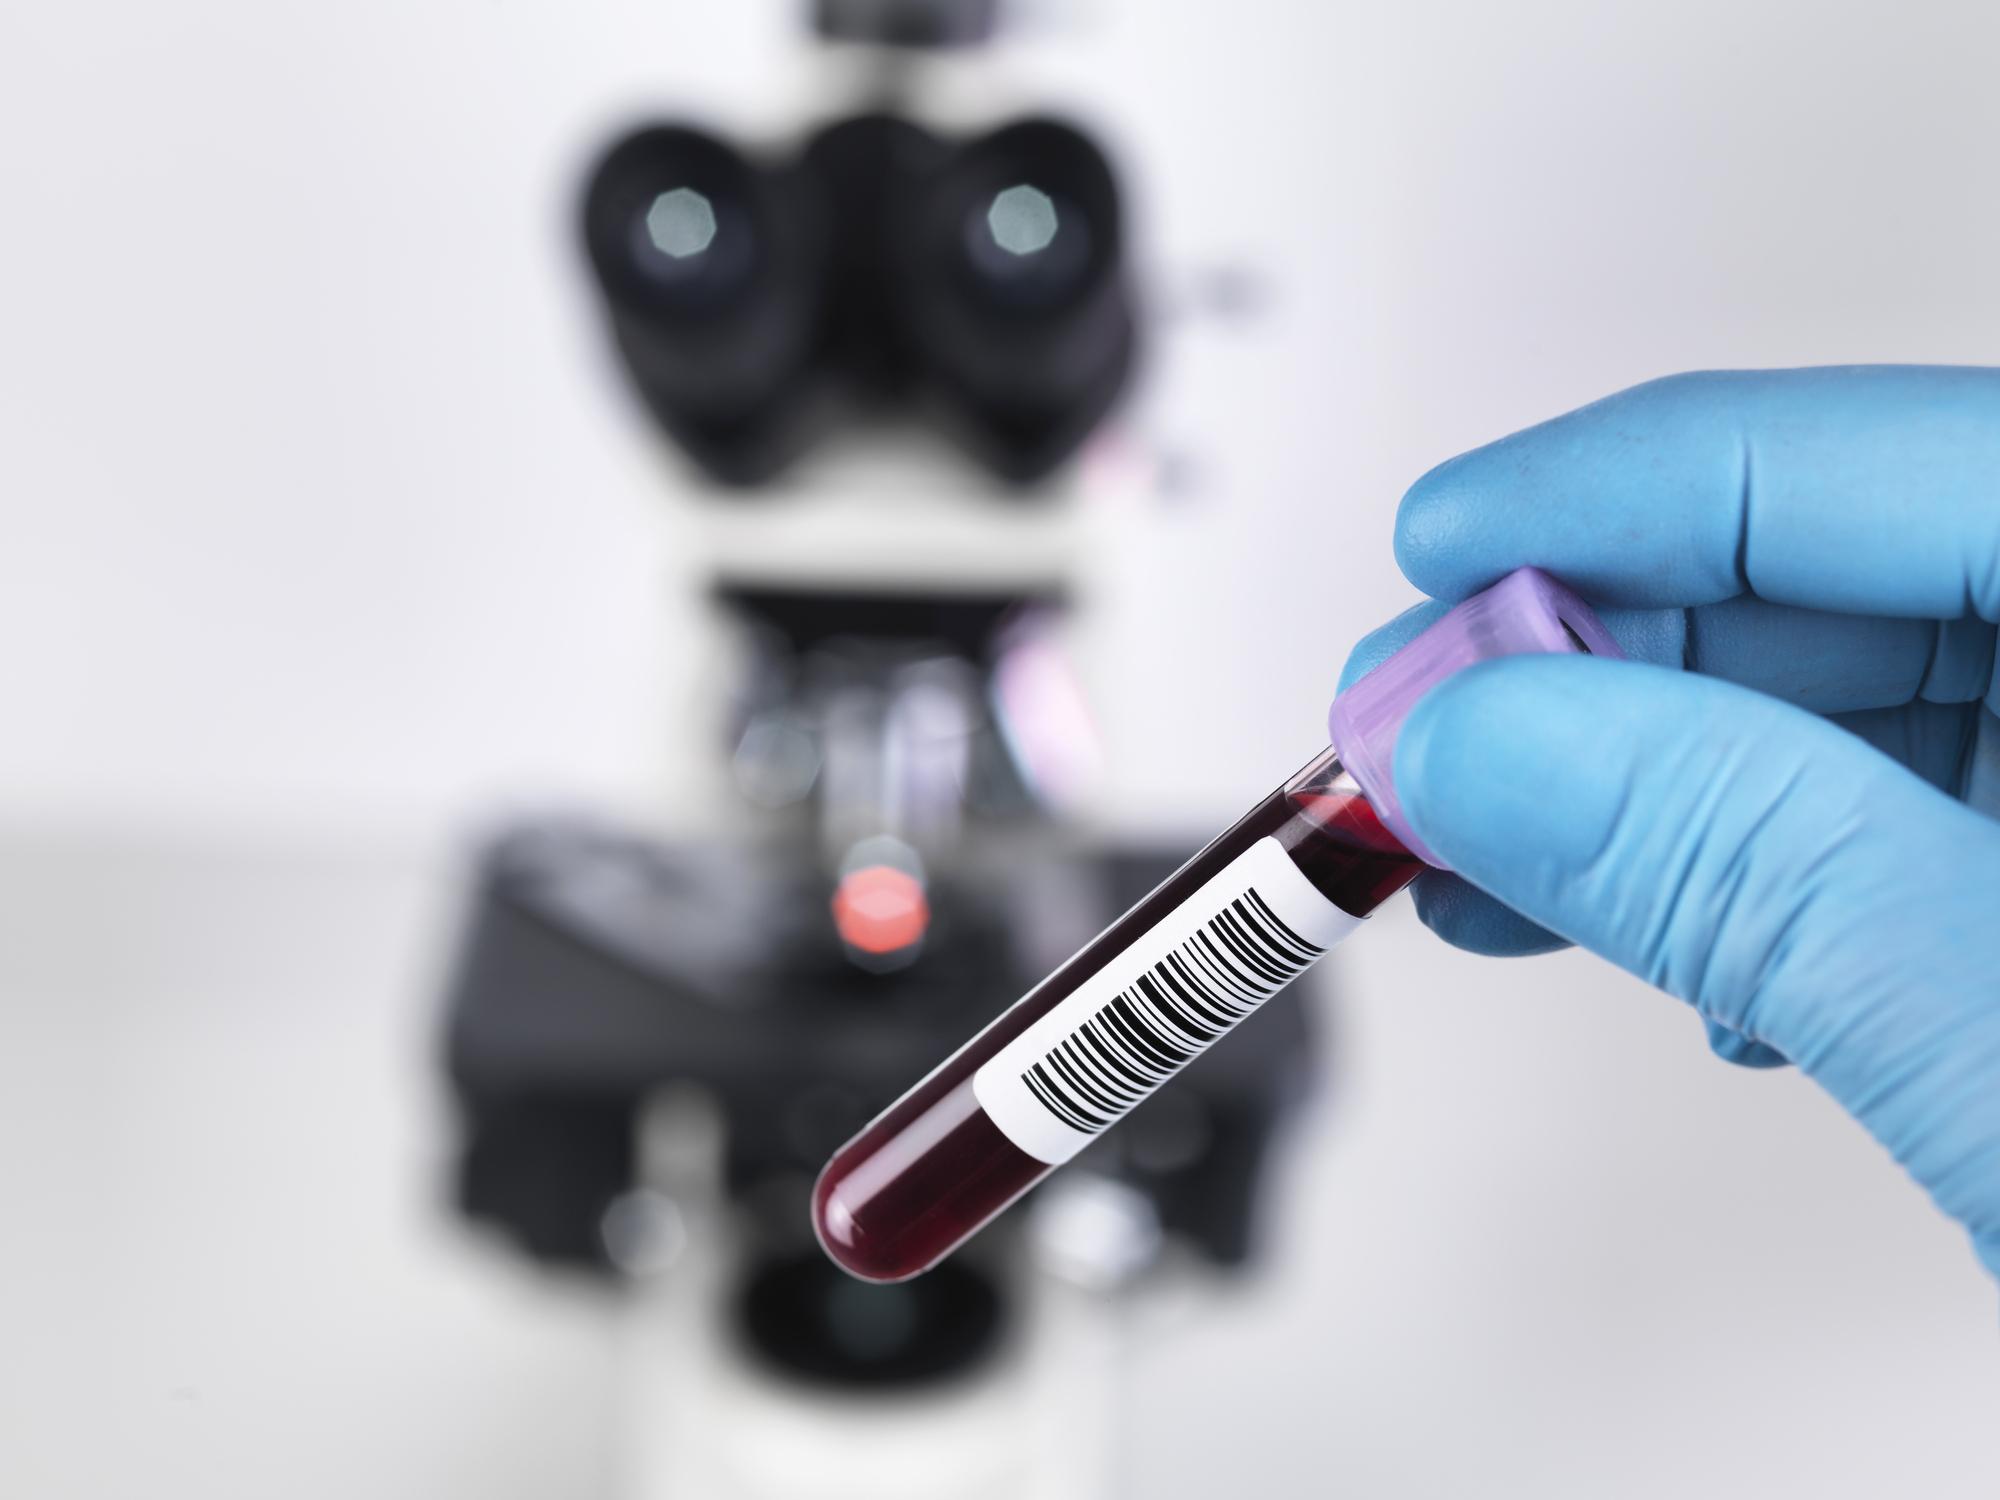 CEO,Simranjit Singh, sharing his views on how liquid biopsies